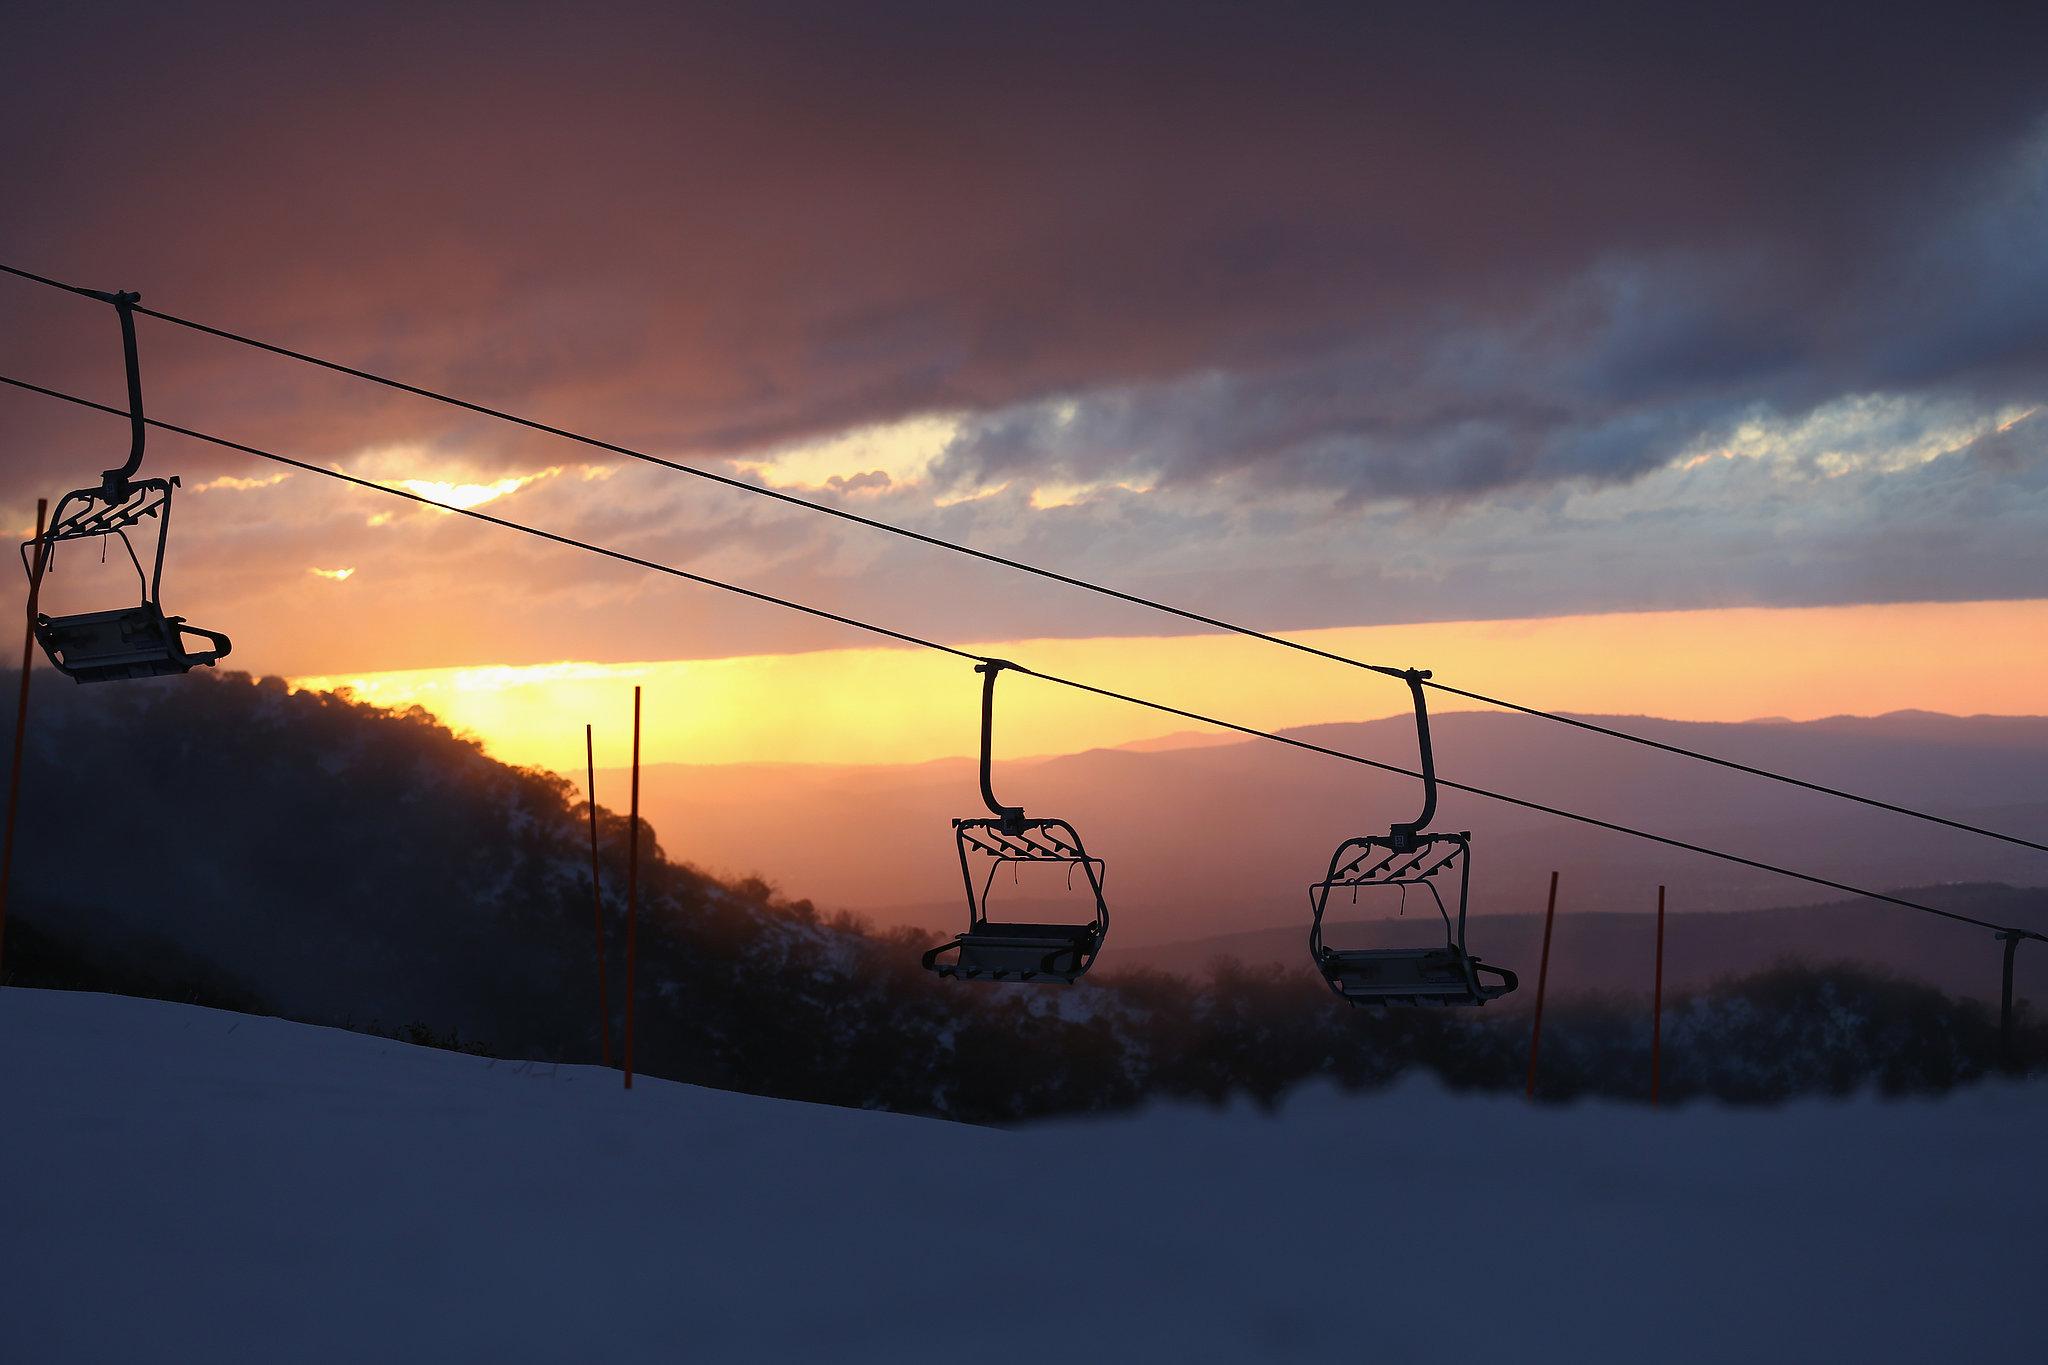 Sunset on the Slopes